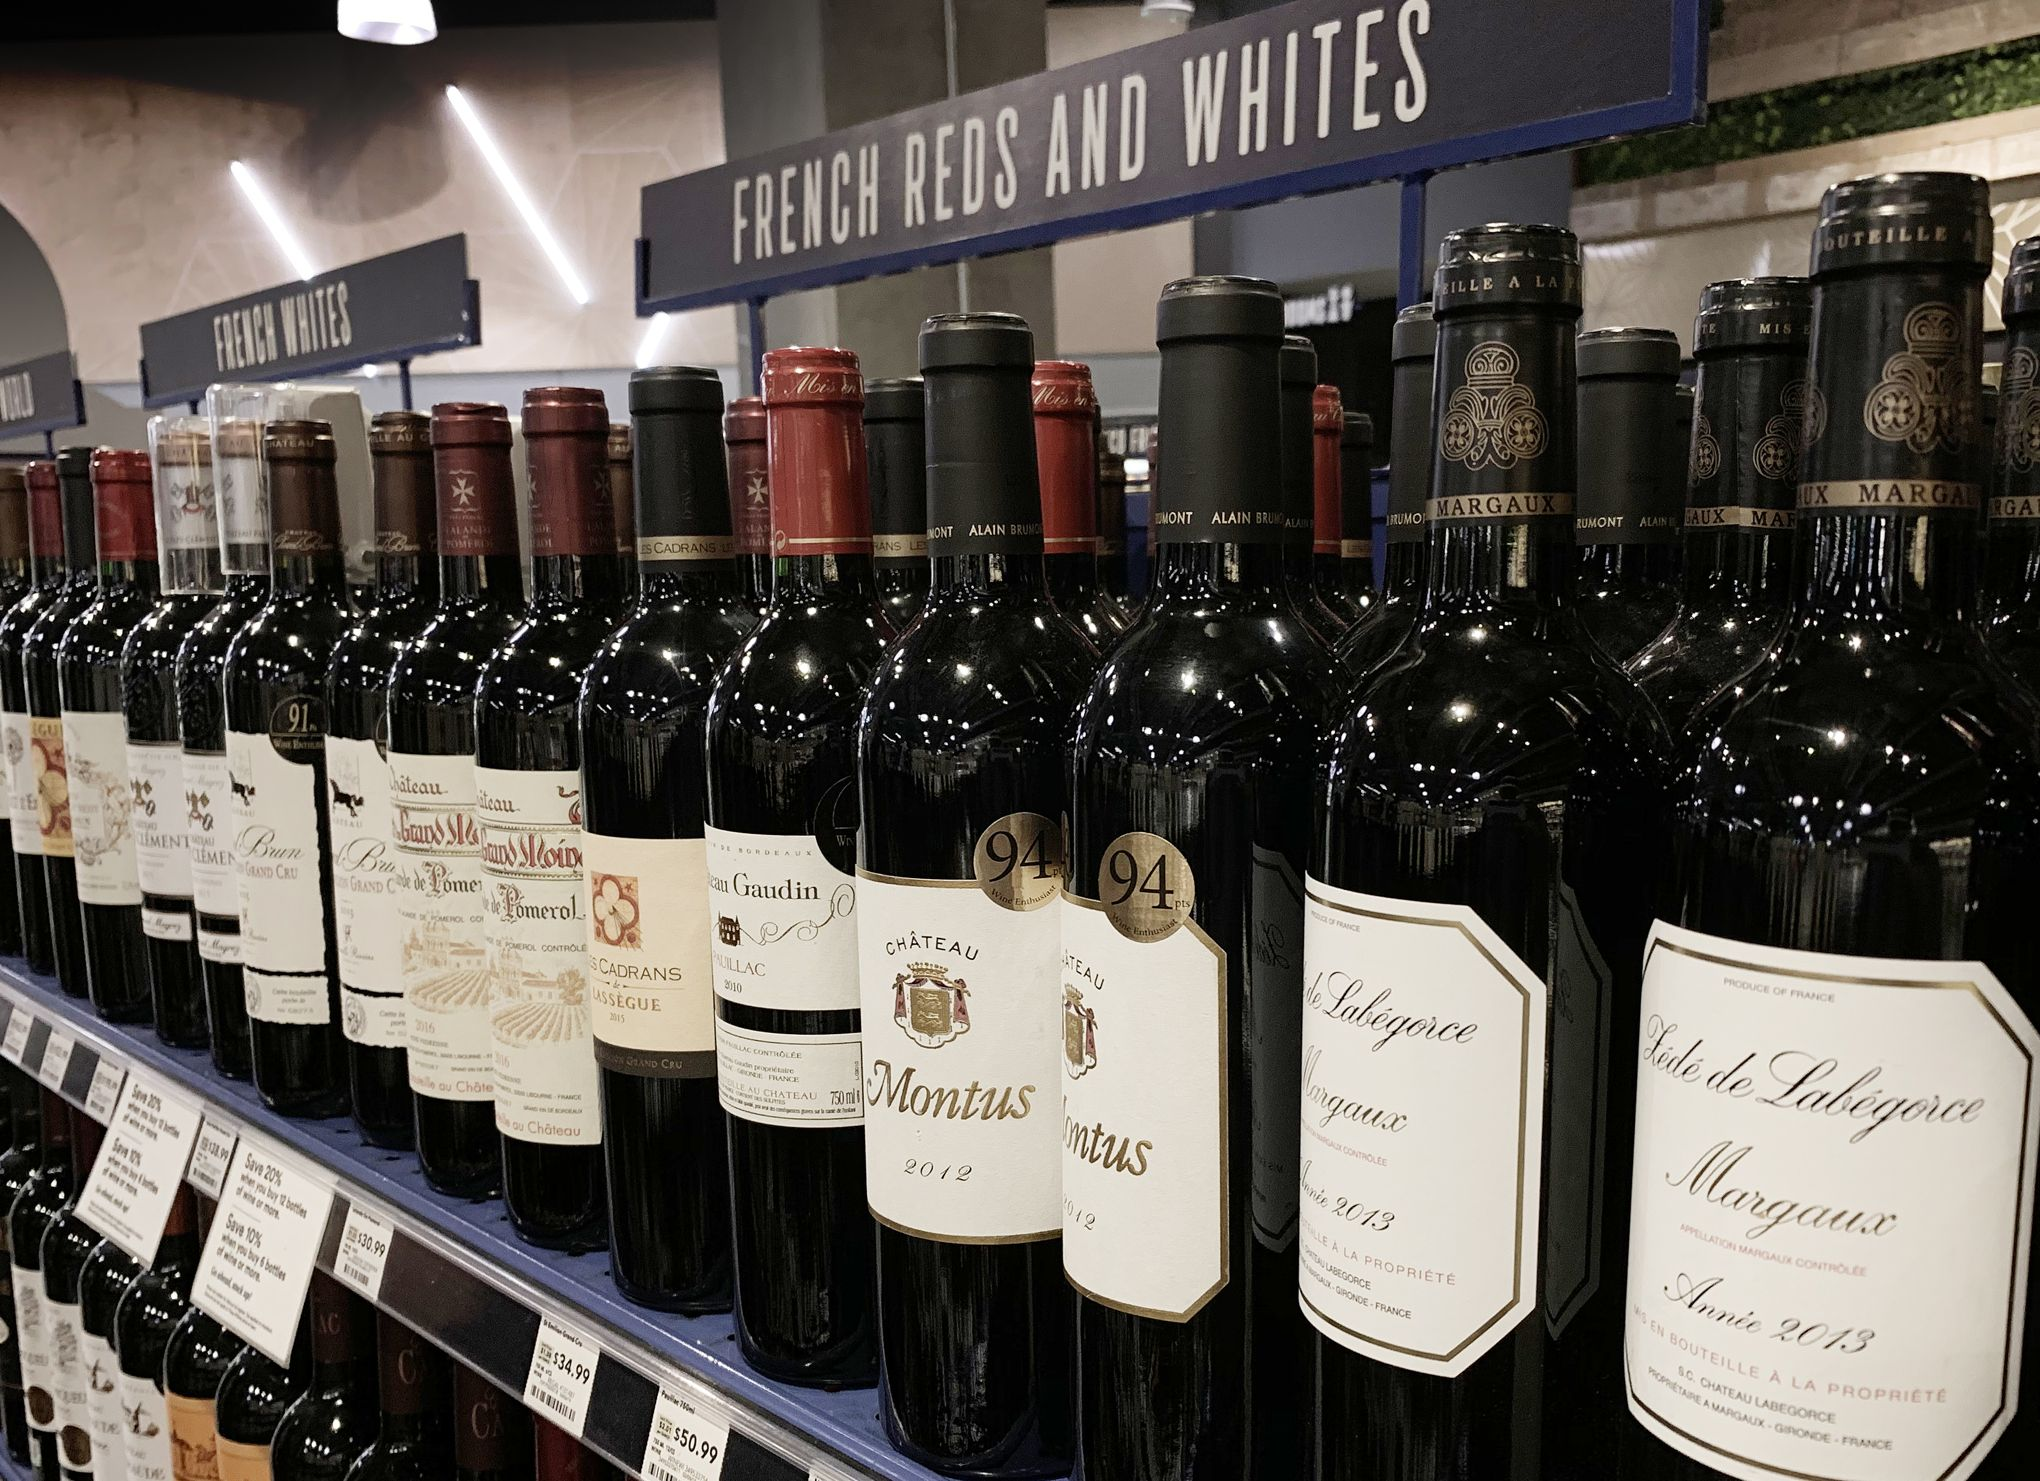 L'export de vin français vers les États-Unis en chute libre